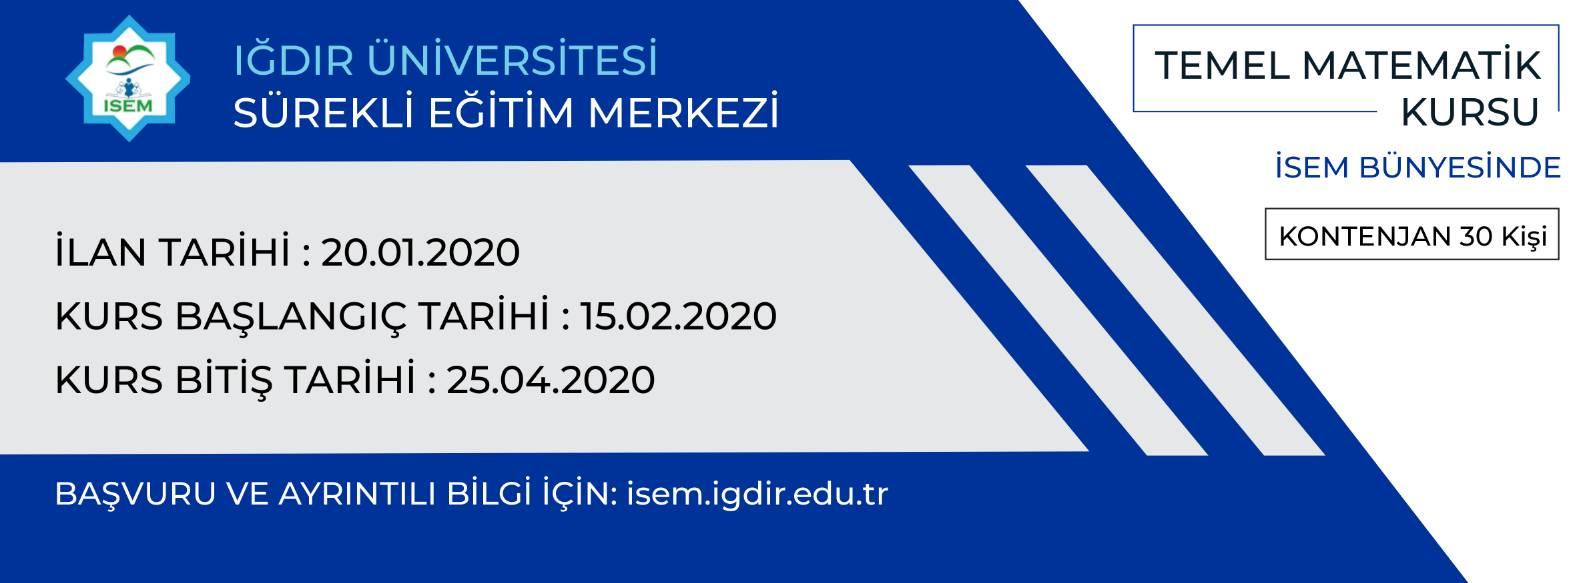 29-01-2020-temel-matematik-kursu-banner-2-w.jpg